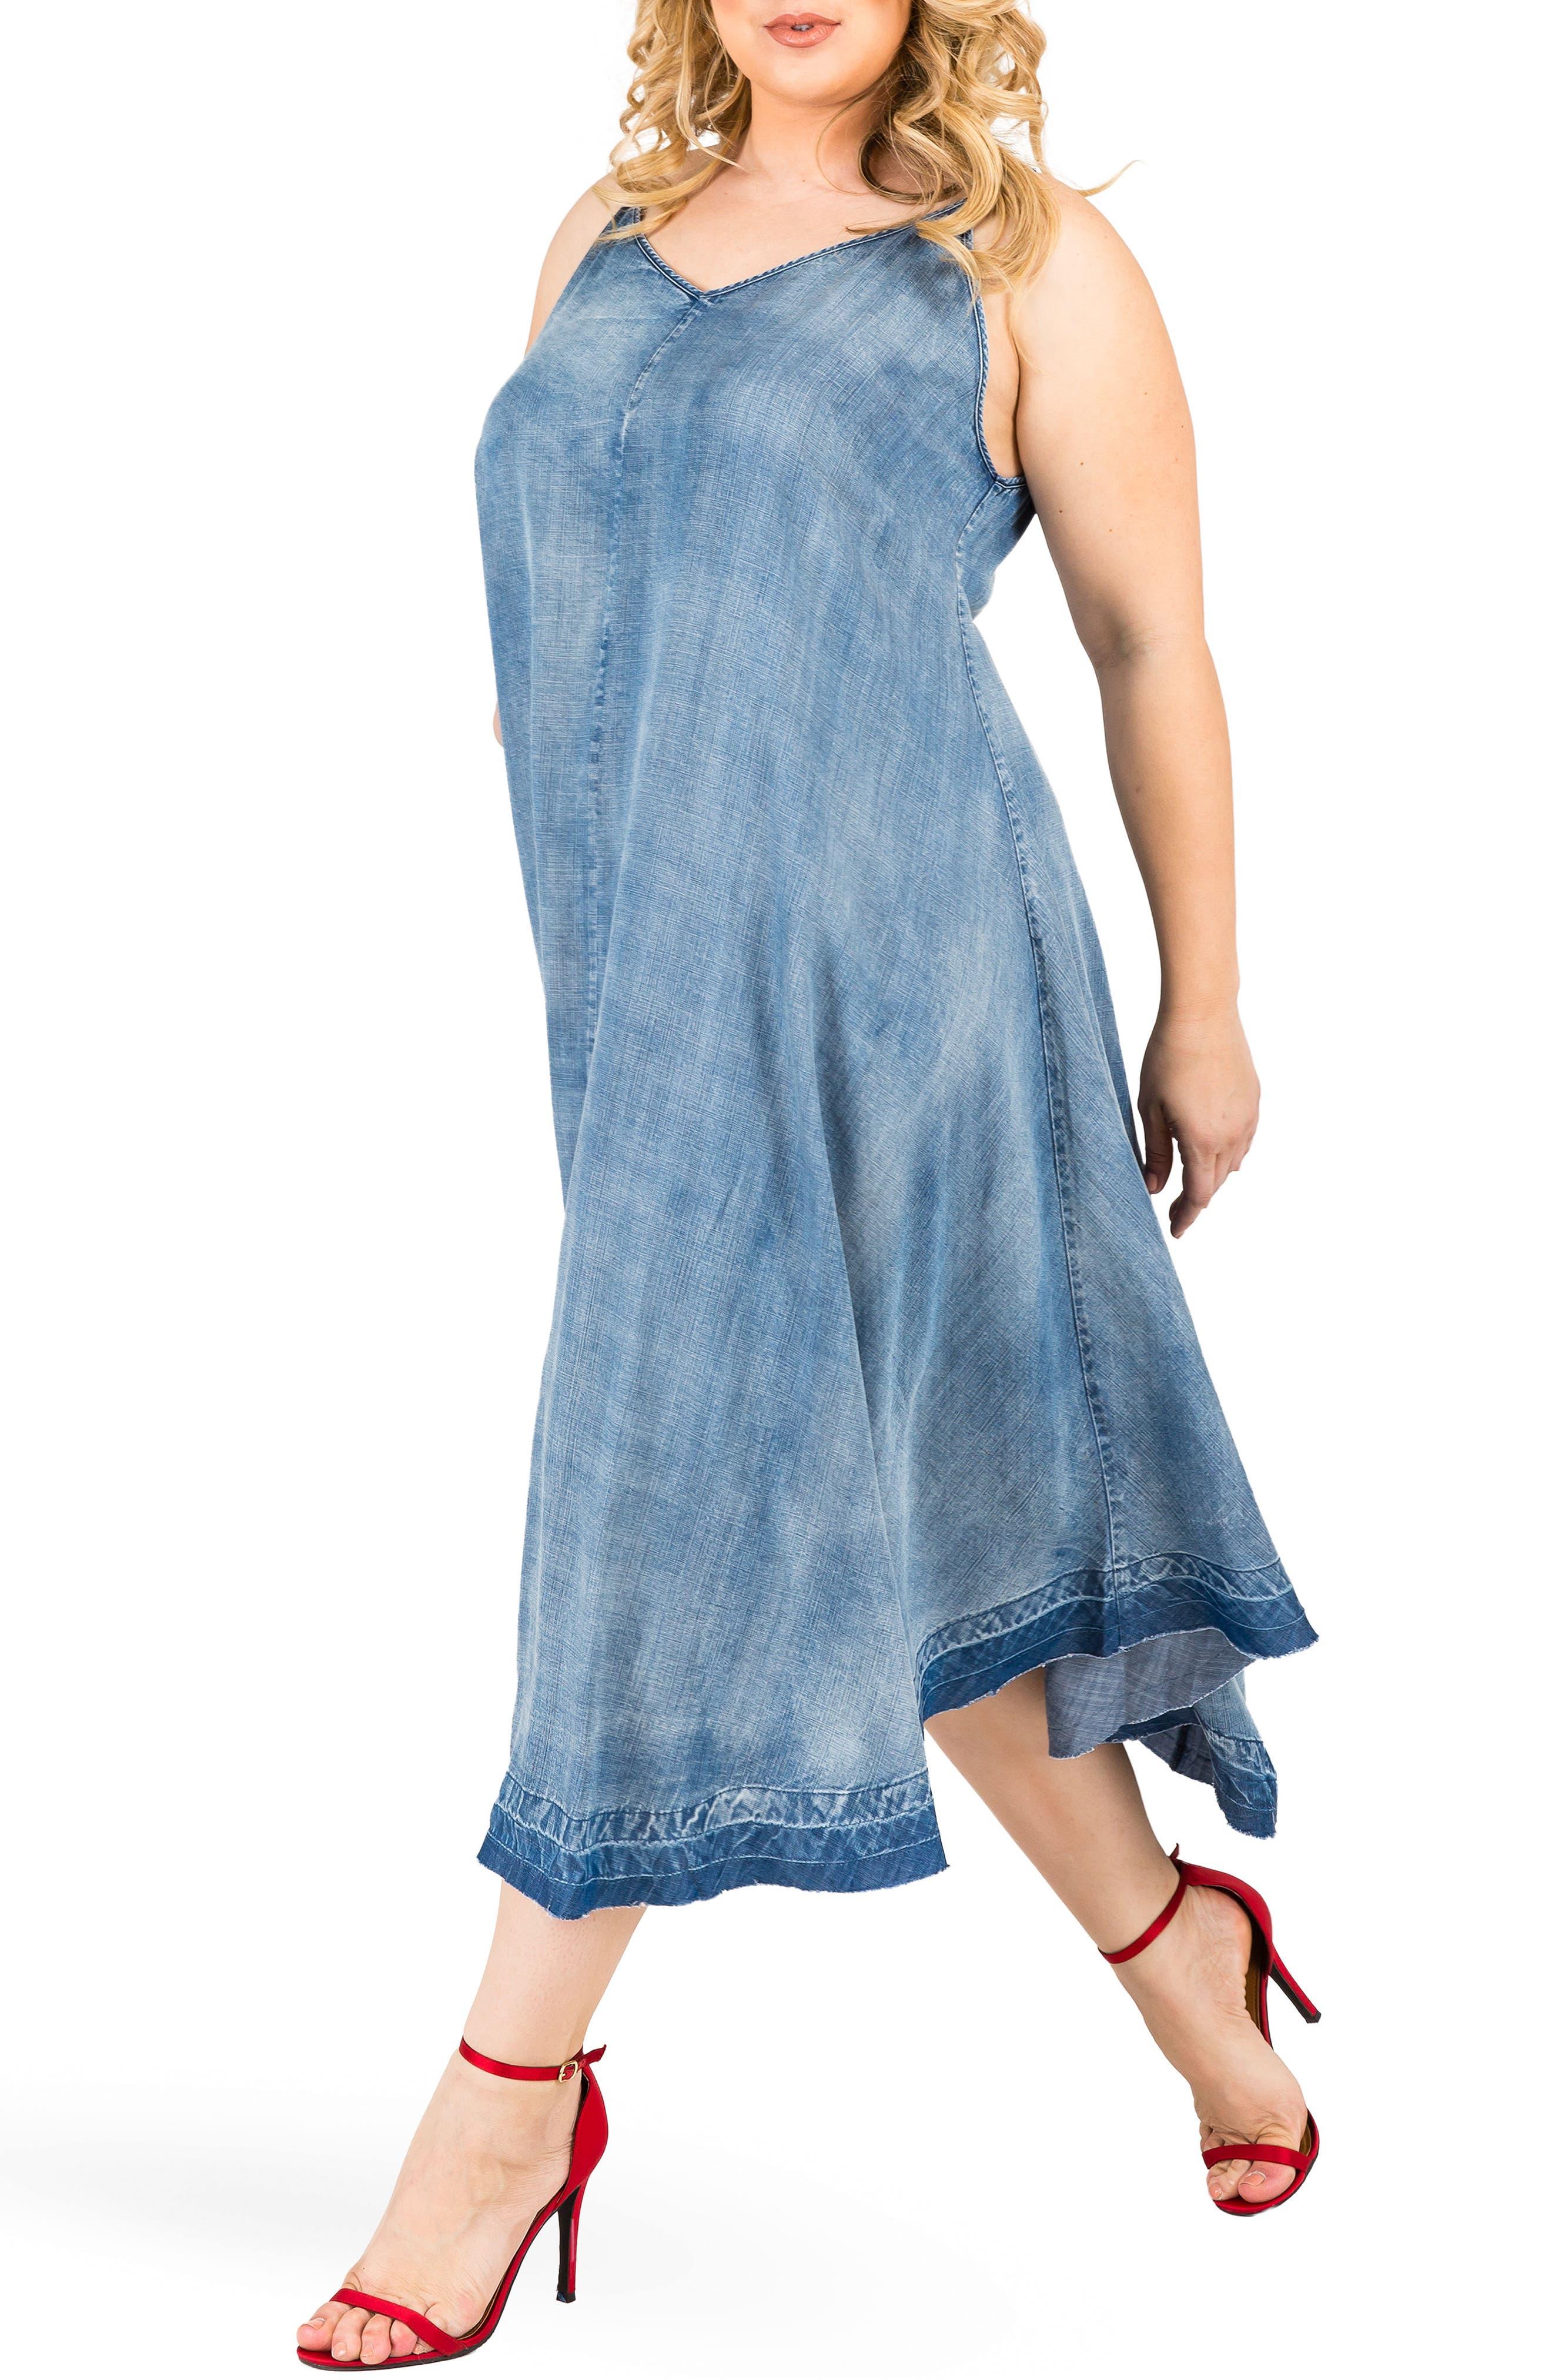 Taylor Tank Denim Midi Dress,                             Alternate thumbnail 4, color,                             MEDIUM BLUE